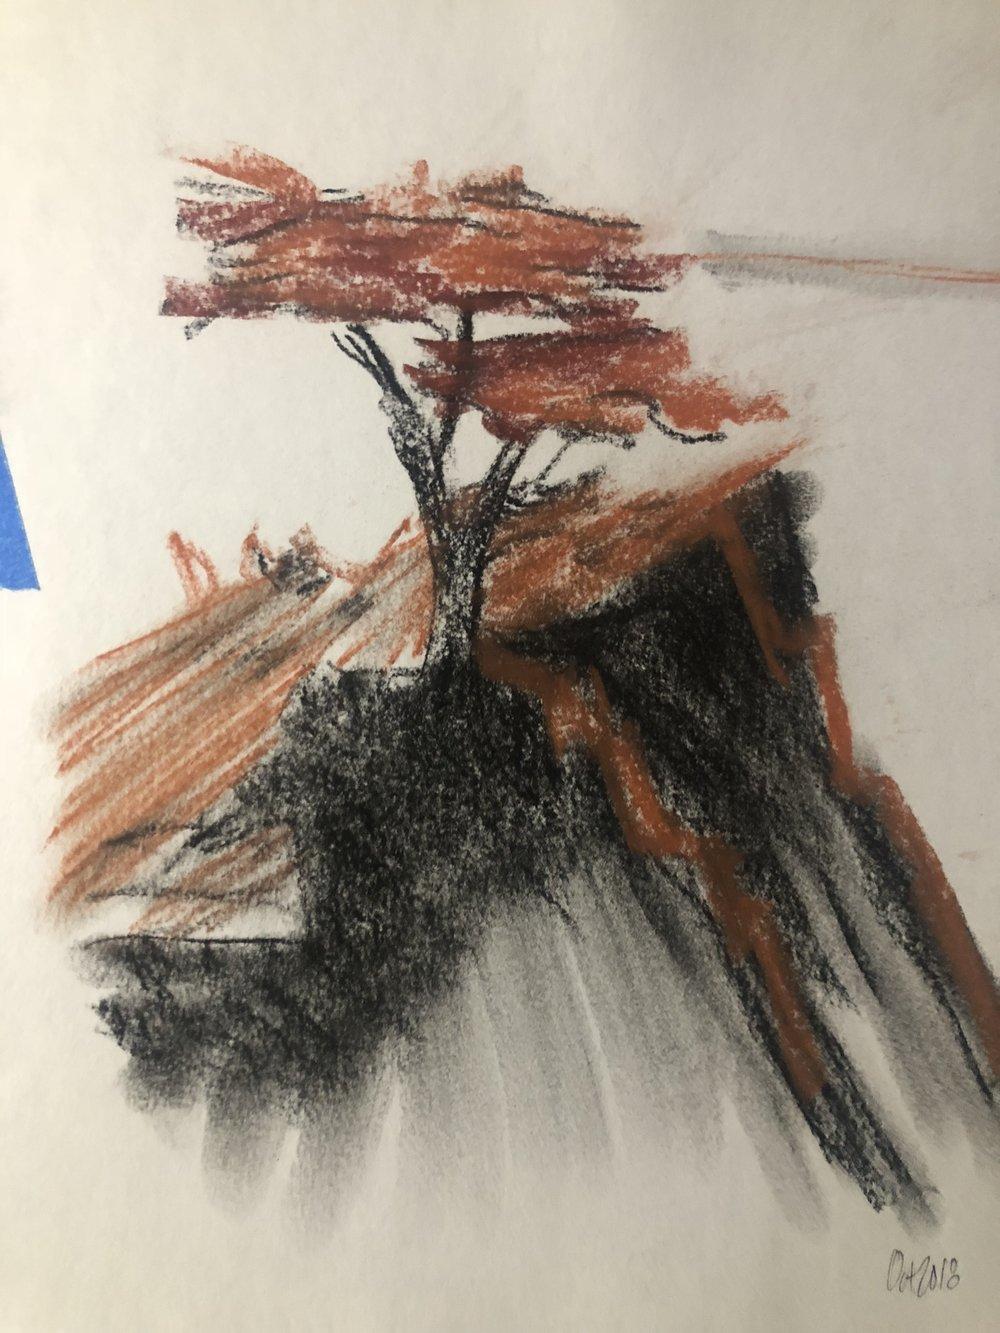 Study, 8x10 inches, Conte Crayon